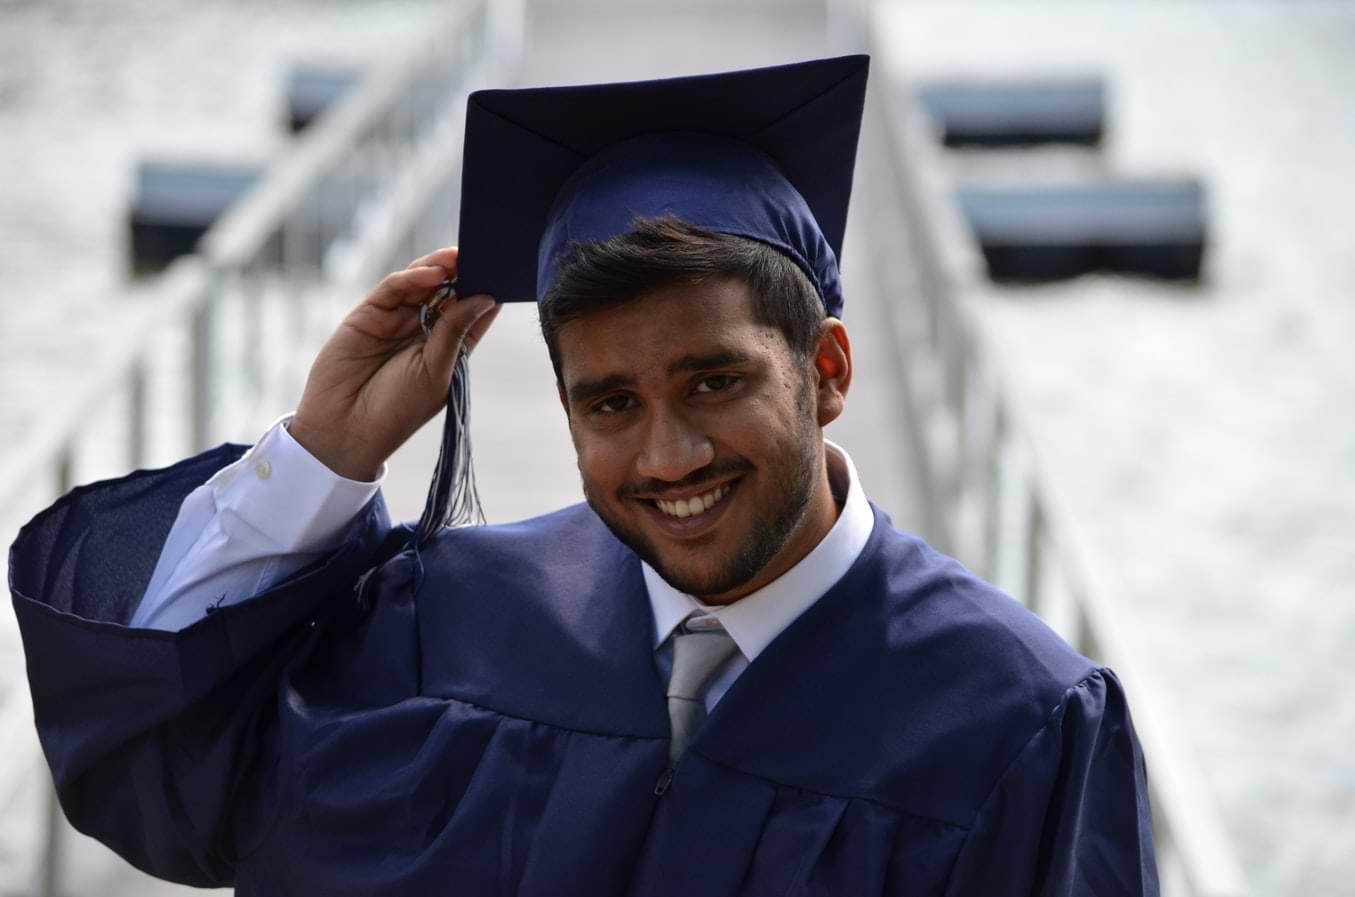 Bachelor's Degree in Psychology